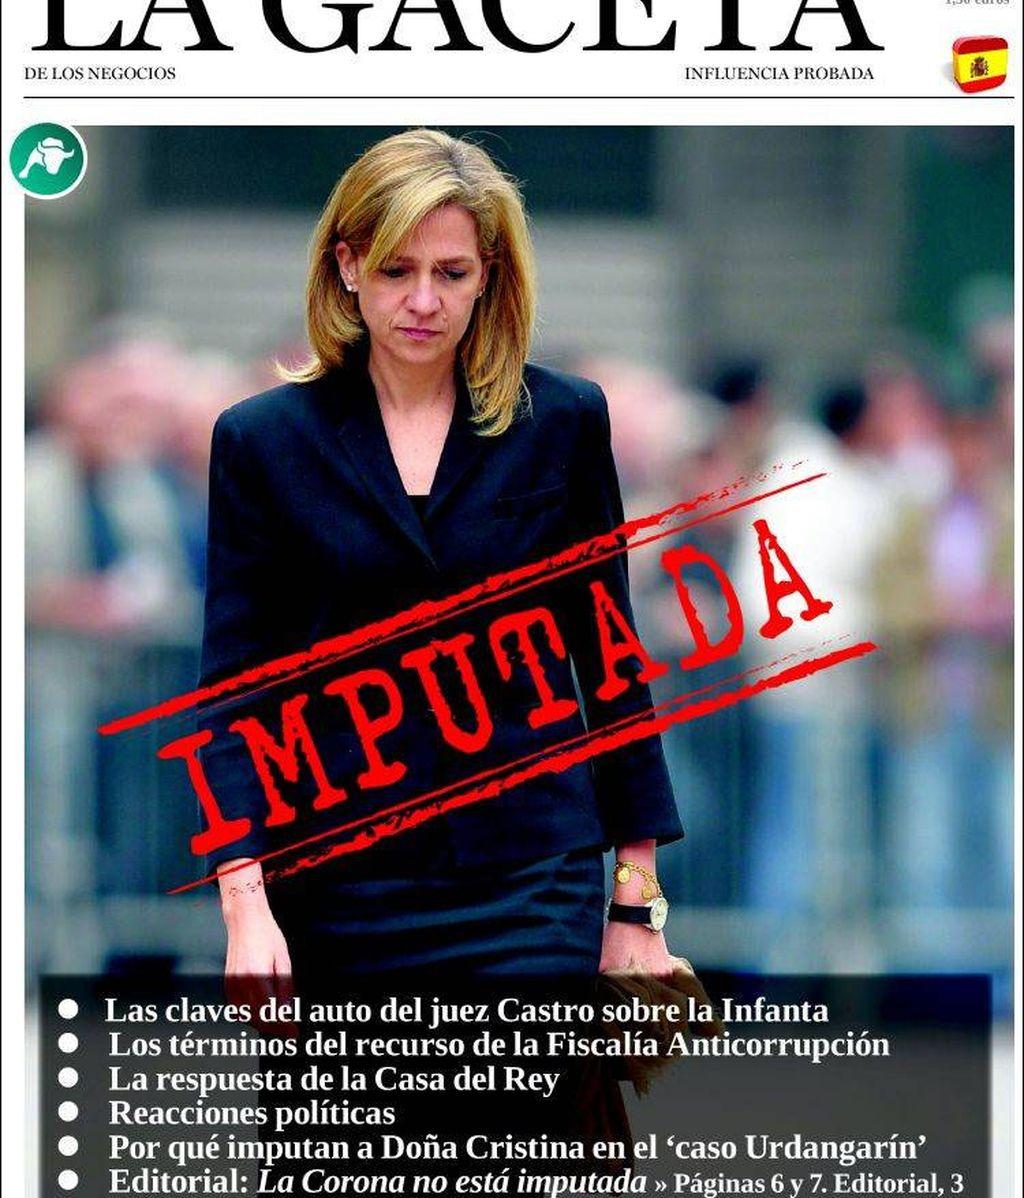 Así ve la prensa la imputación de la infanta Cristina